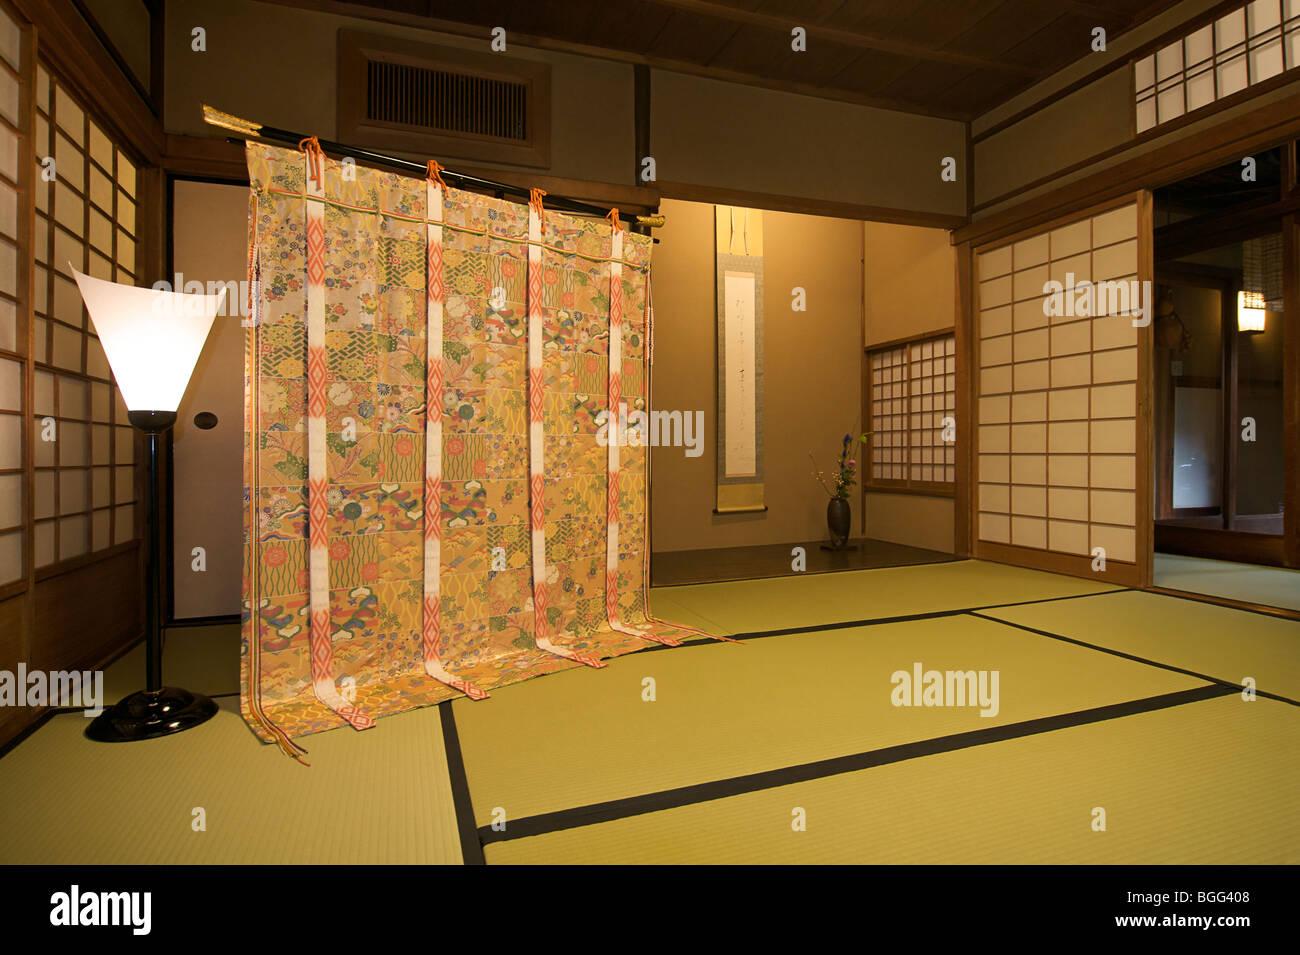 Elaborate kimono fabric displayed at Yoshikawa ryokan, Kyoto, Japan. - Stock Image